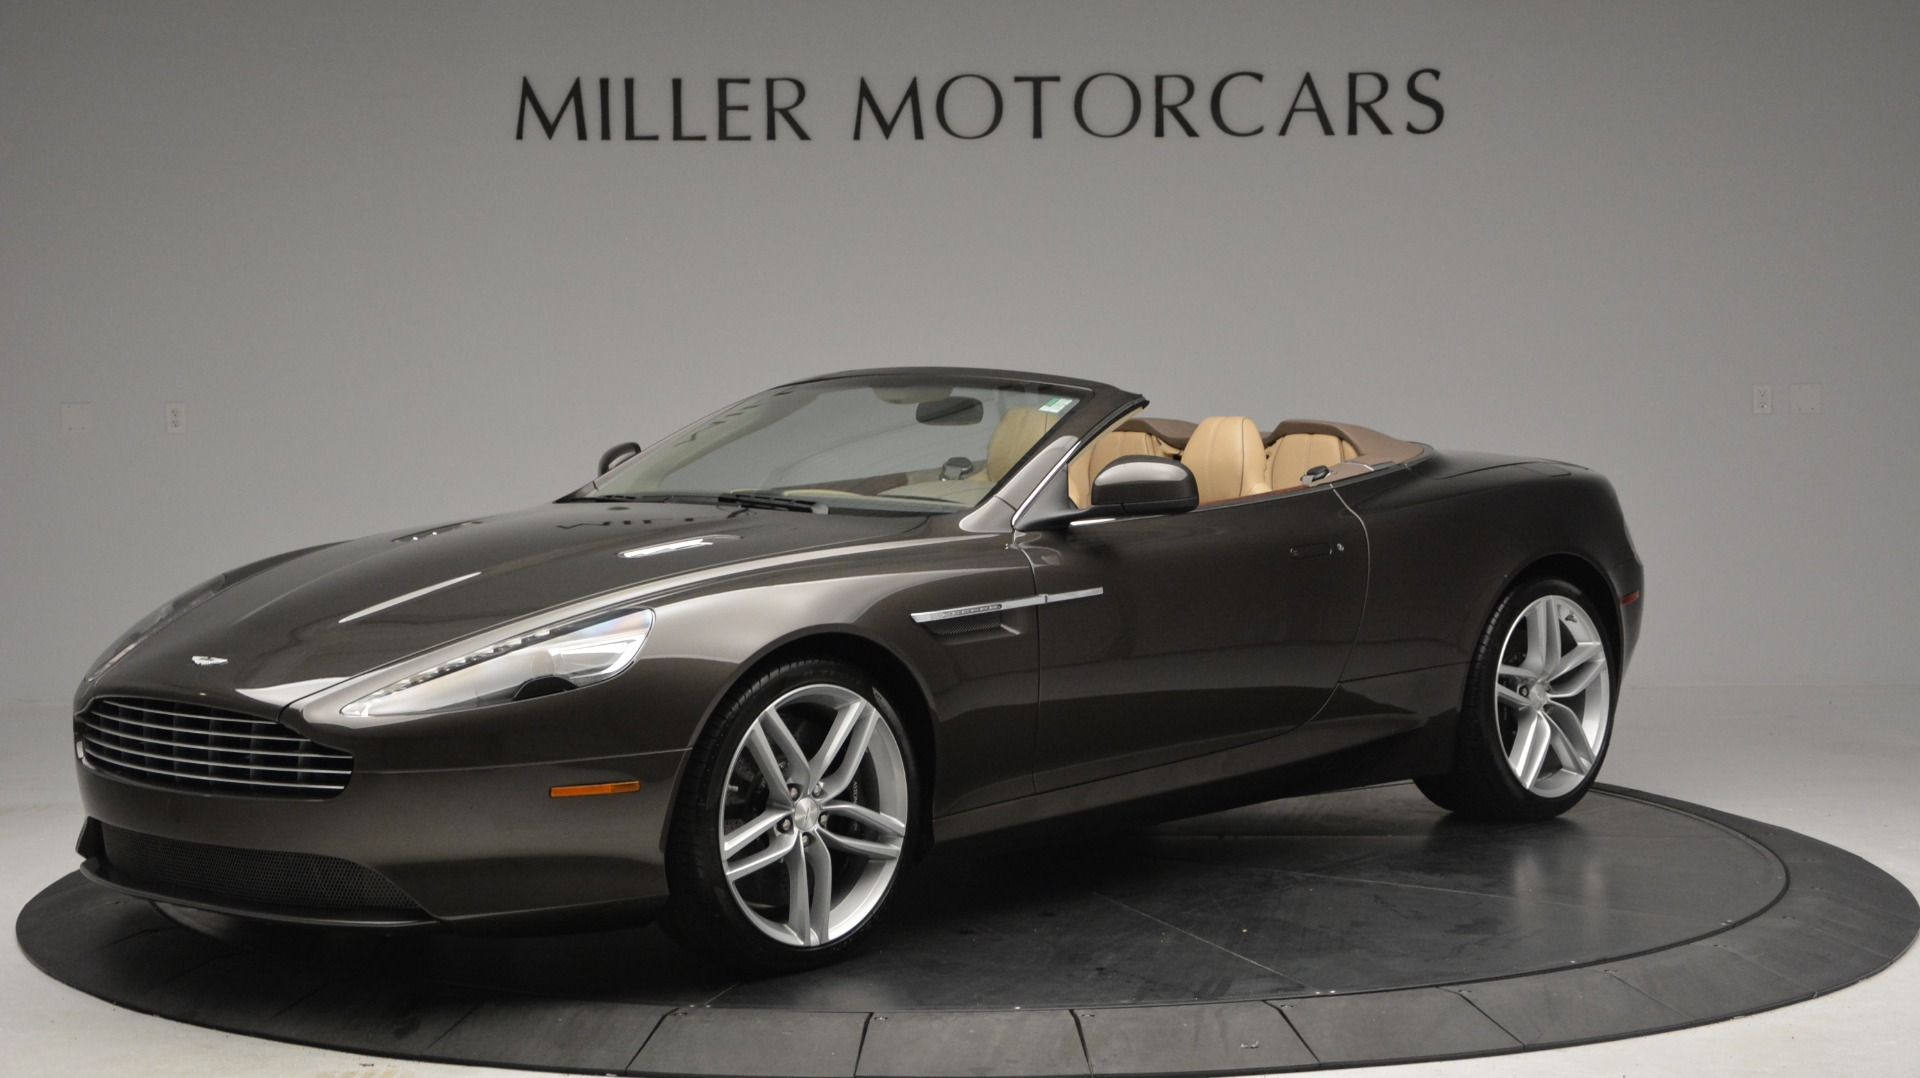 Used 2012 Aston Martin Virage Convertible for sale Sold at Alfa Romeo of Westport in Westport CT 06880 1